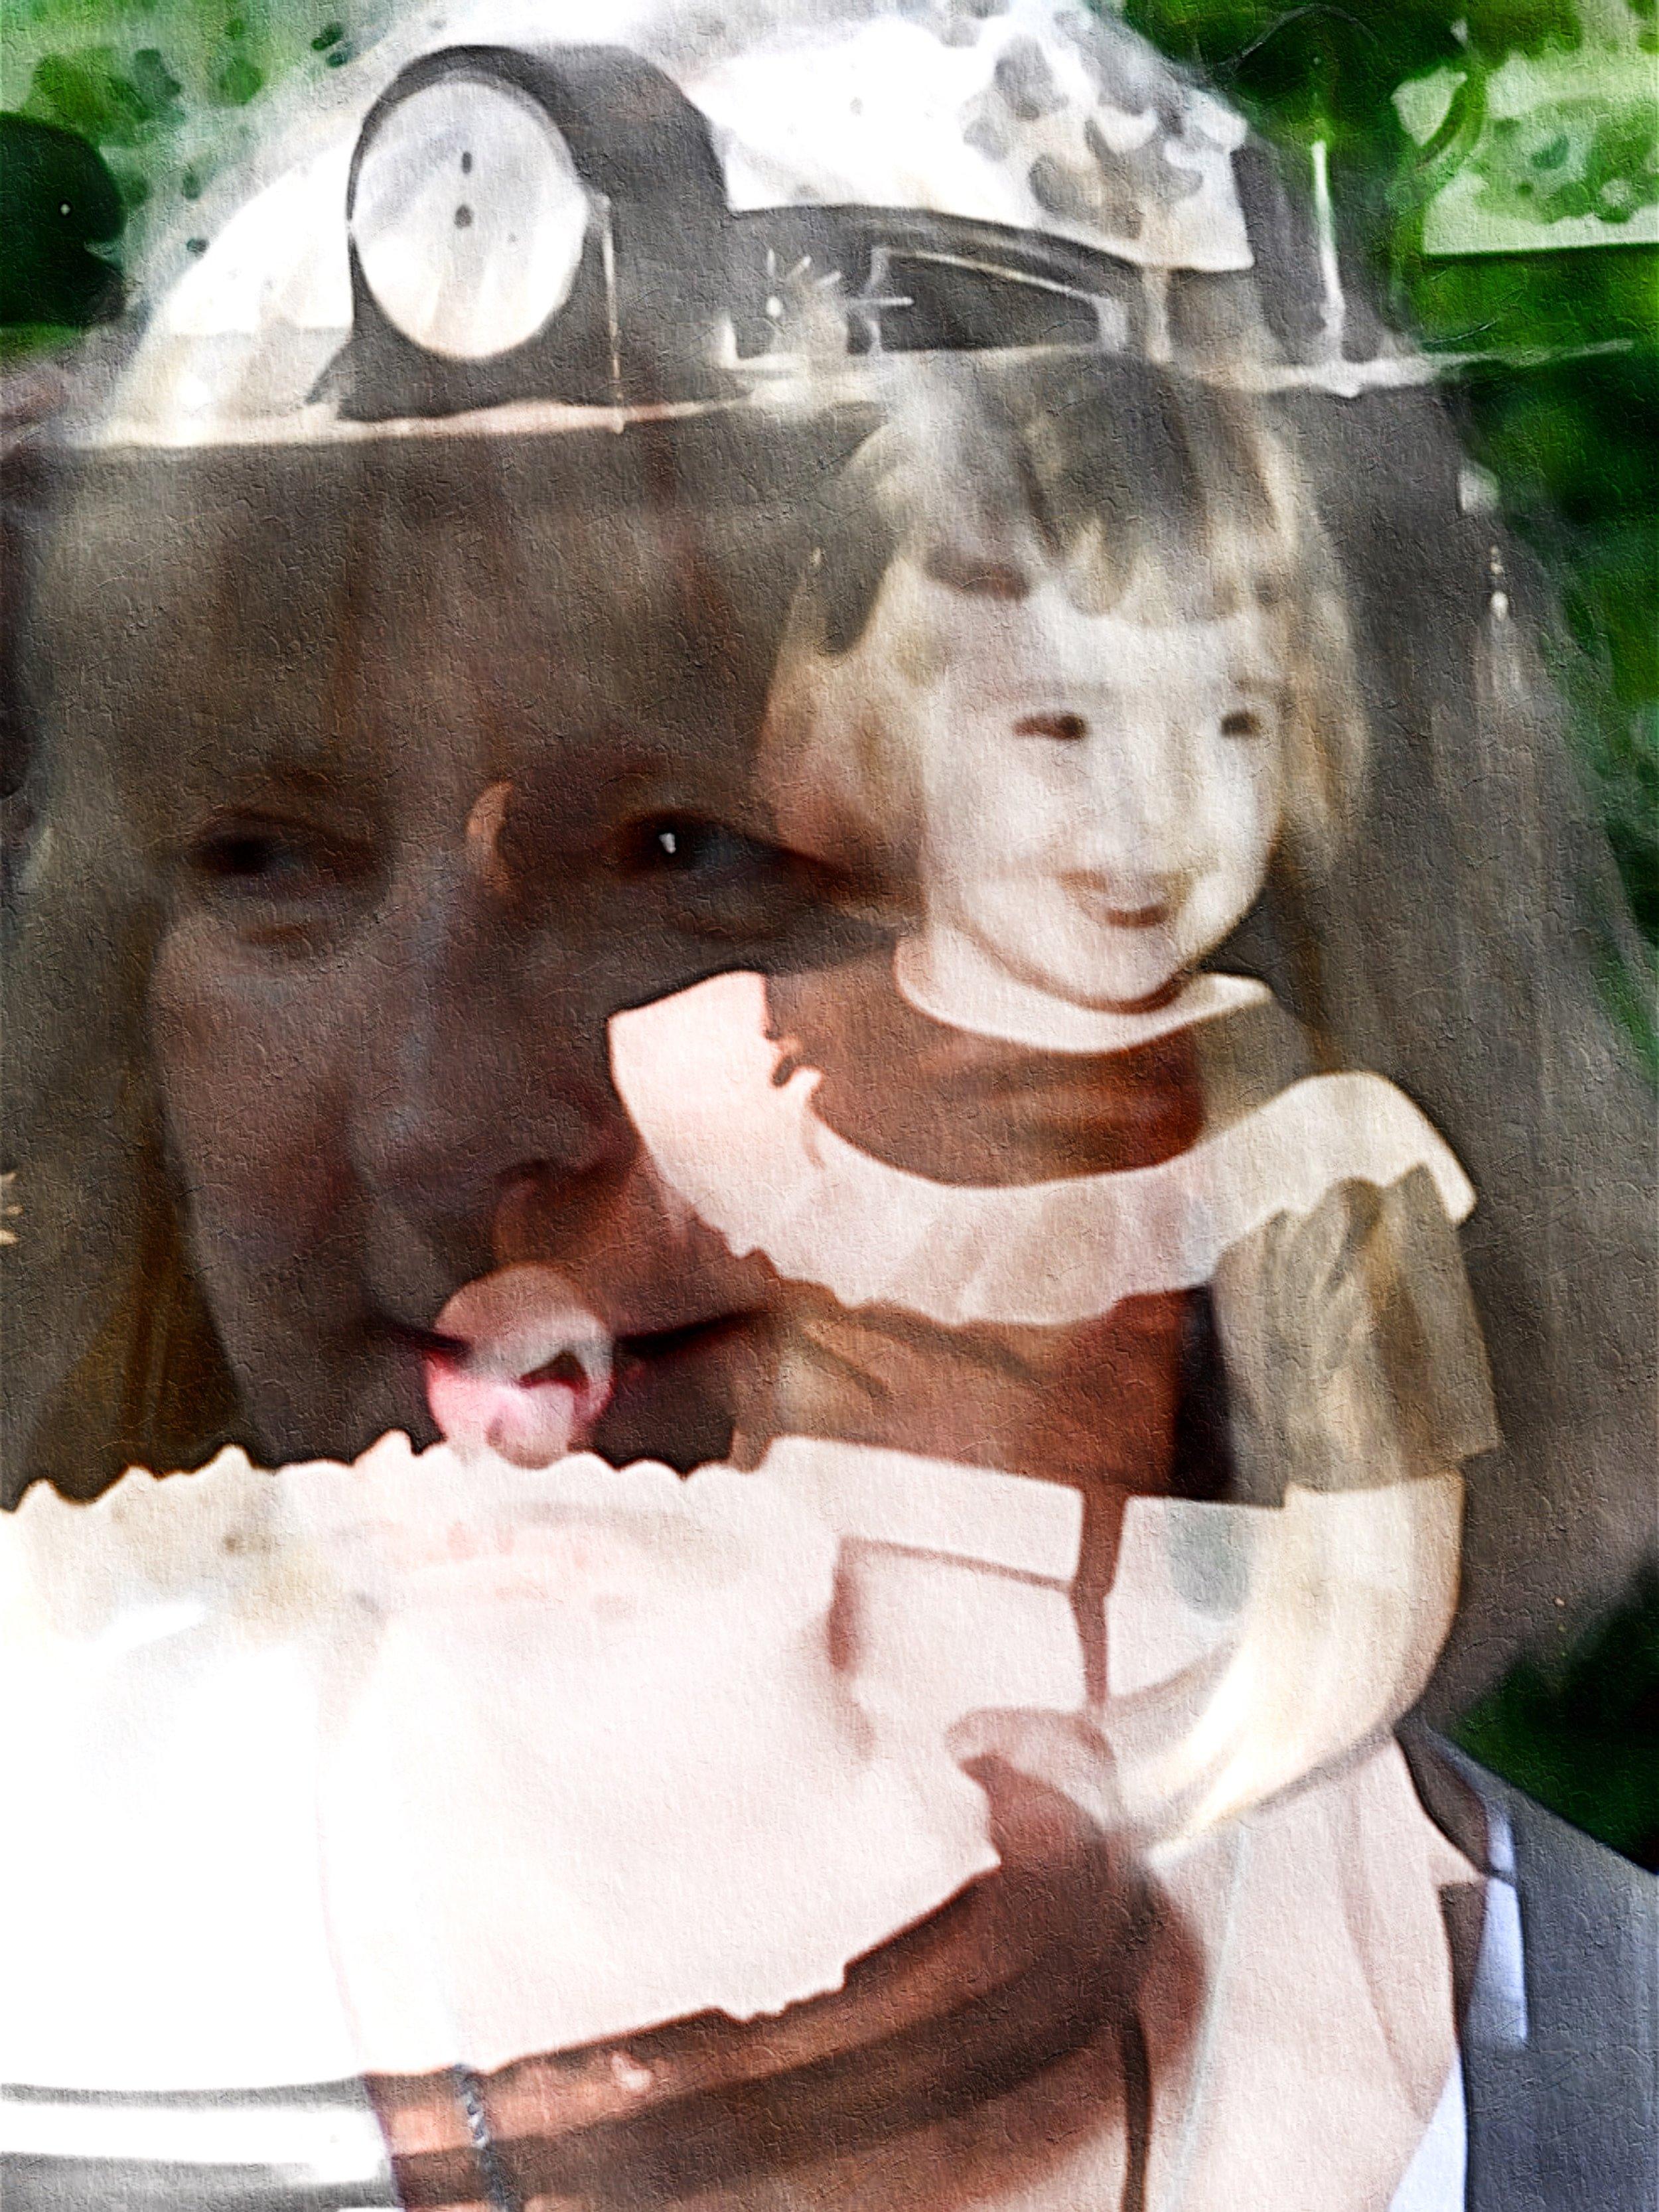 Happy birthday to my best big sister - Fotoda, iColorama